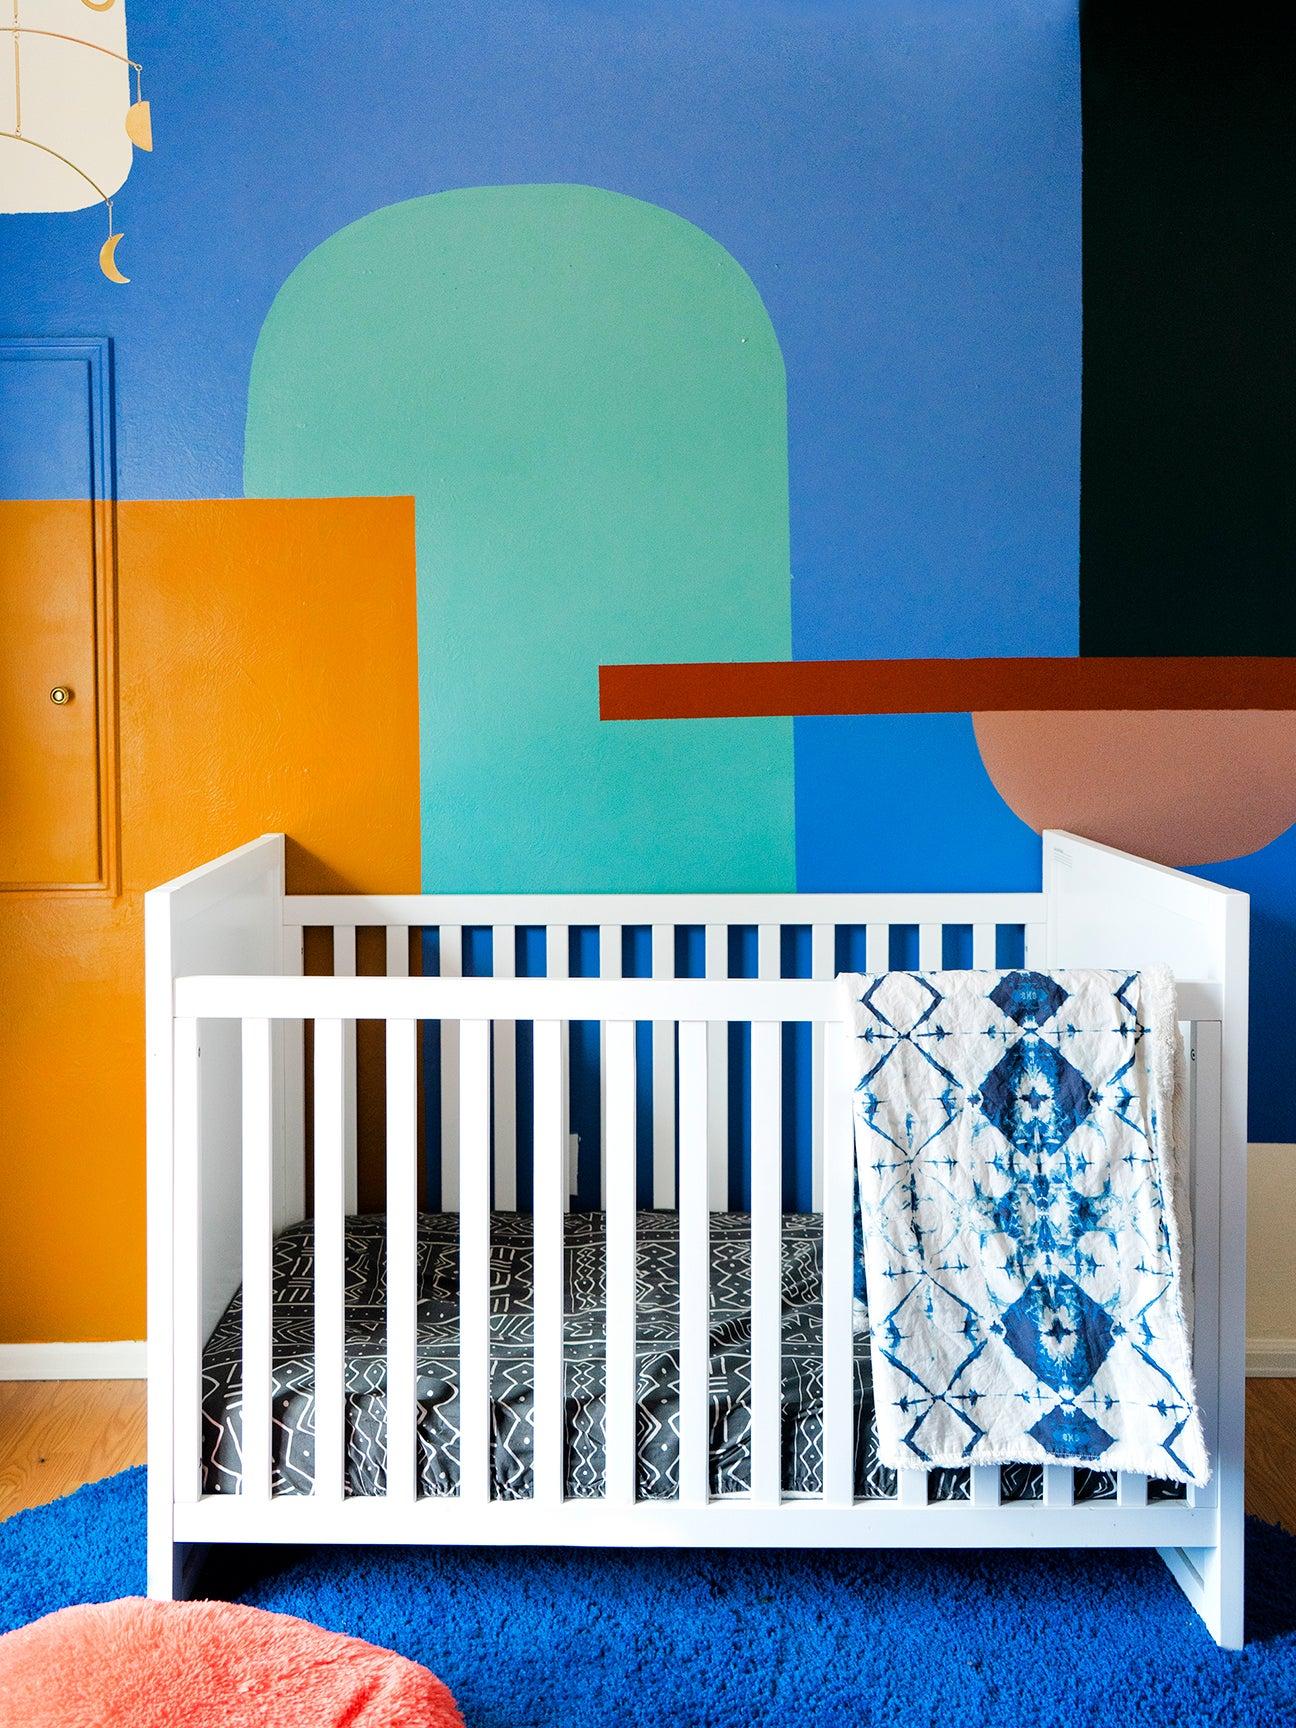 colorful-wall-mural-paint-diy